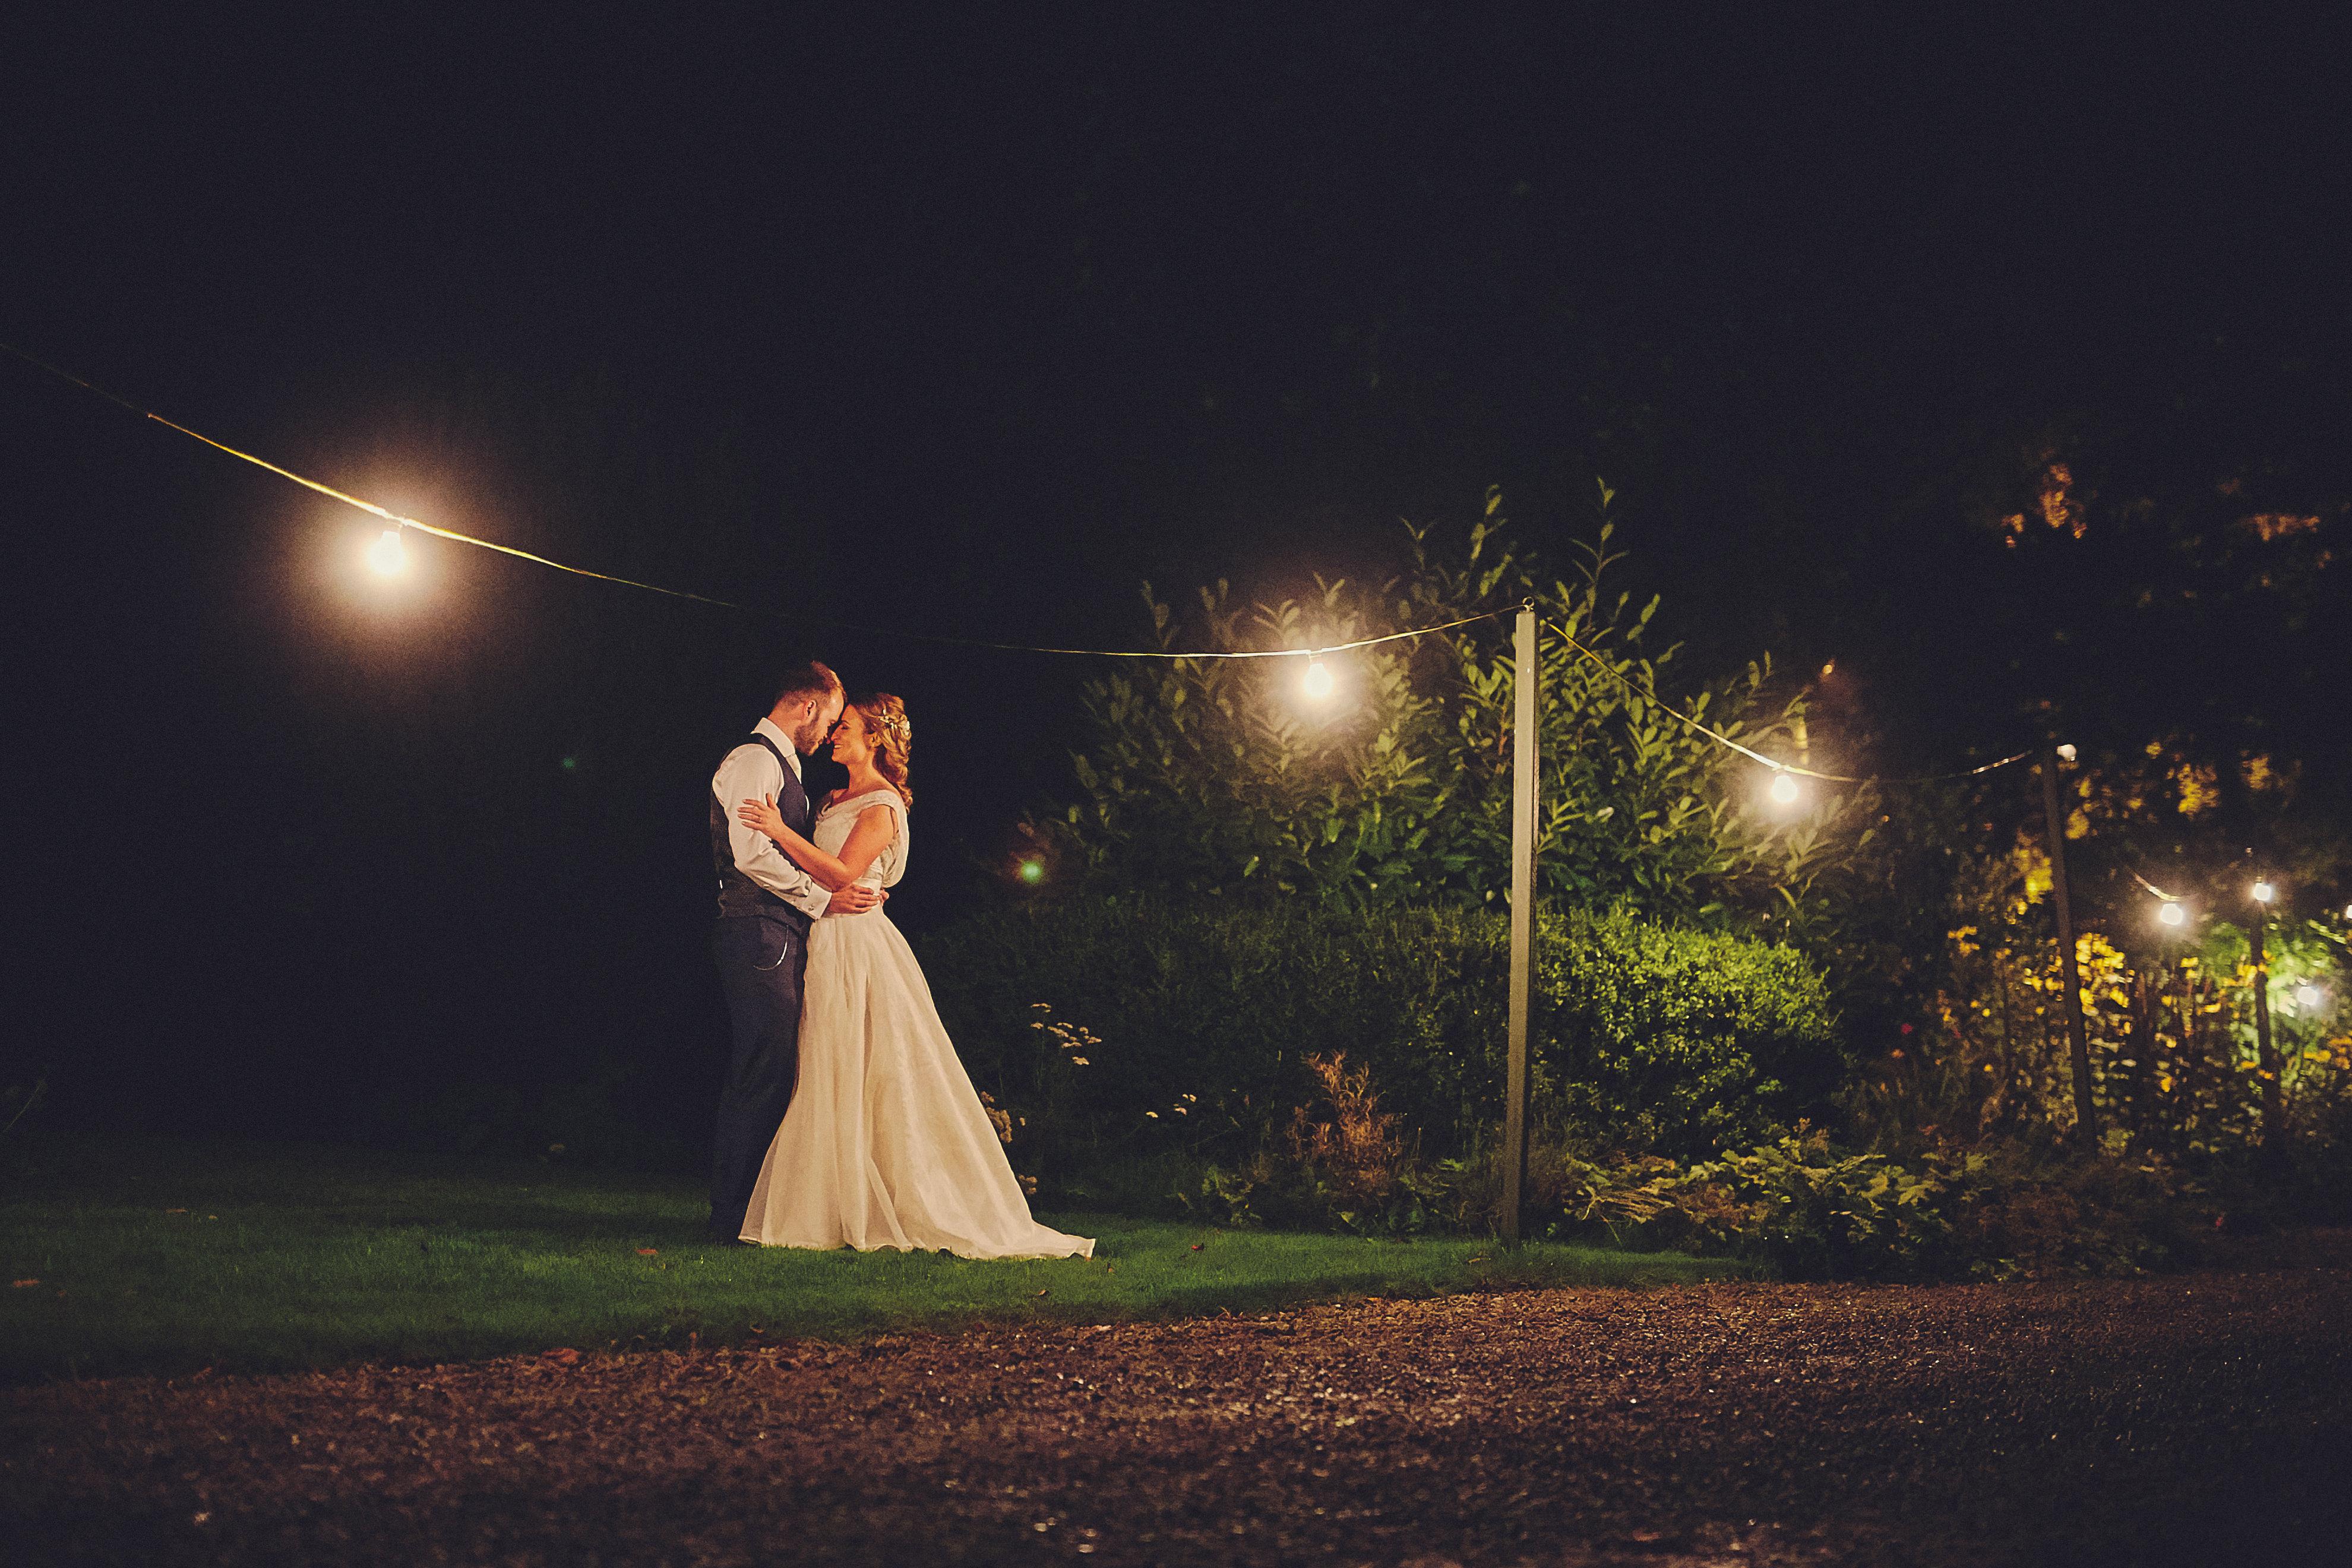 Cloughjordan House weddding151 1 - Cloughjordan House Wedding - Alternative Venue